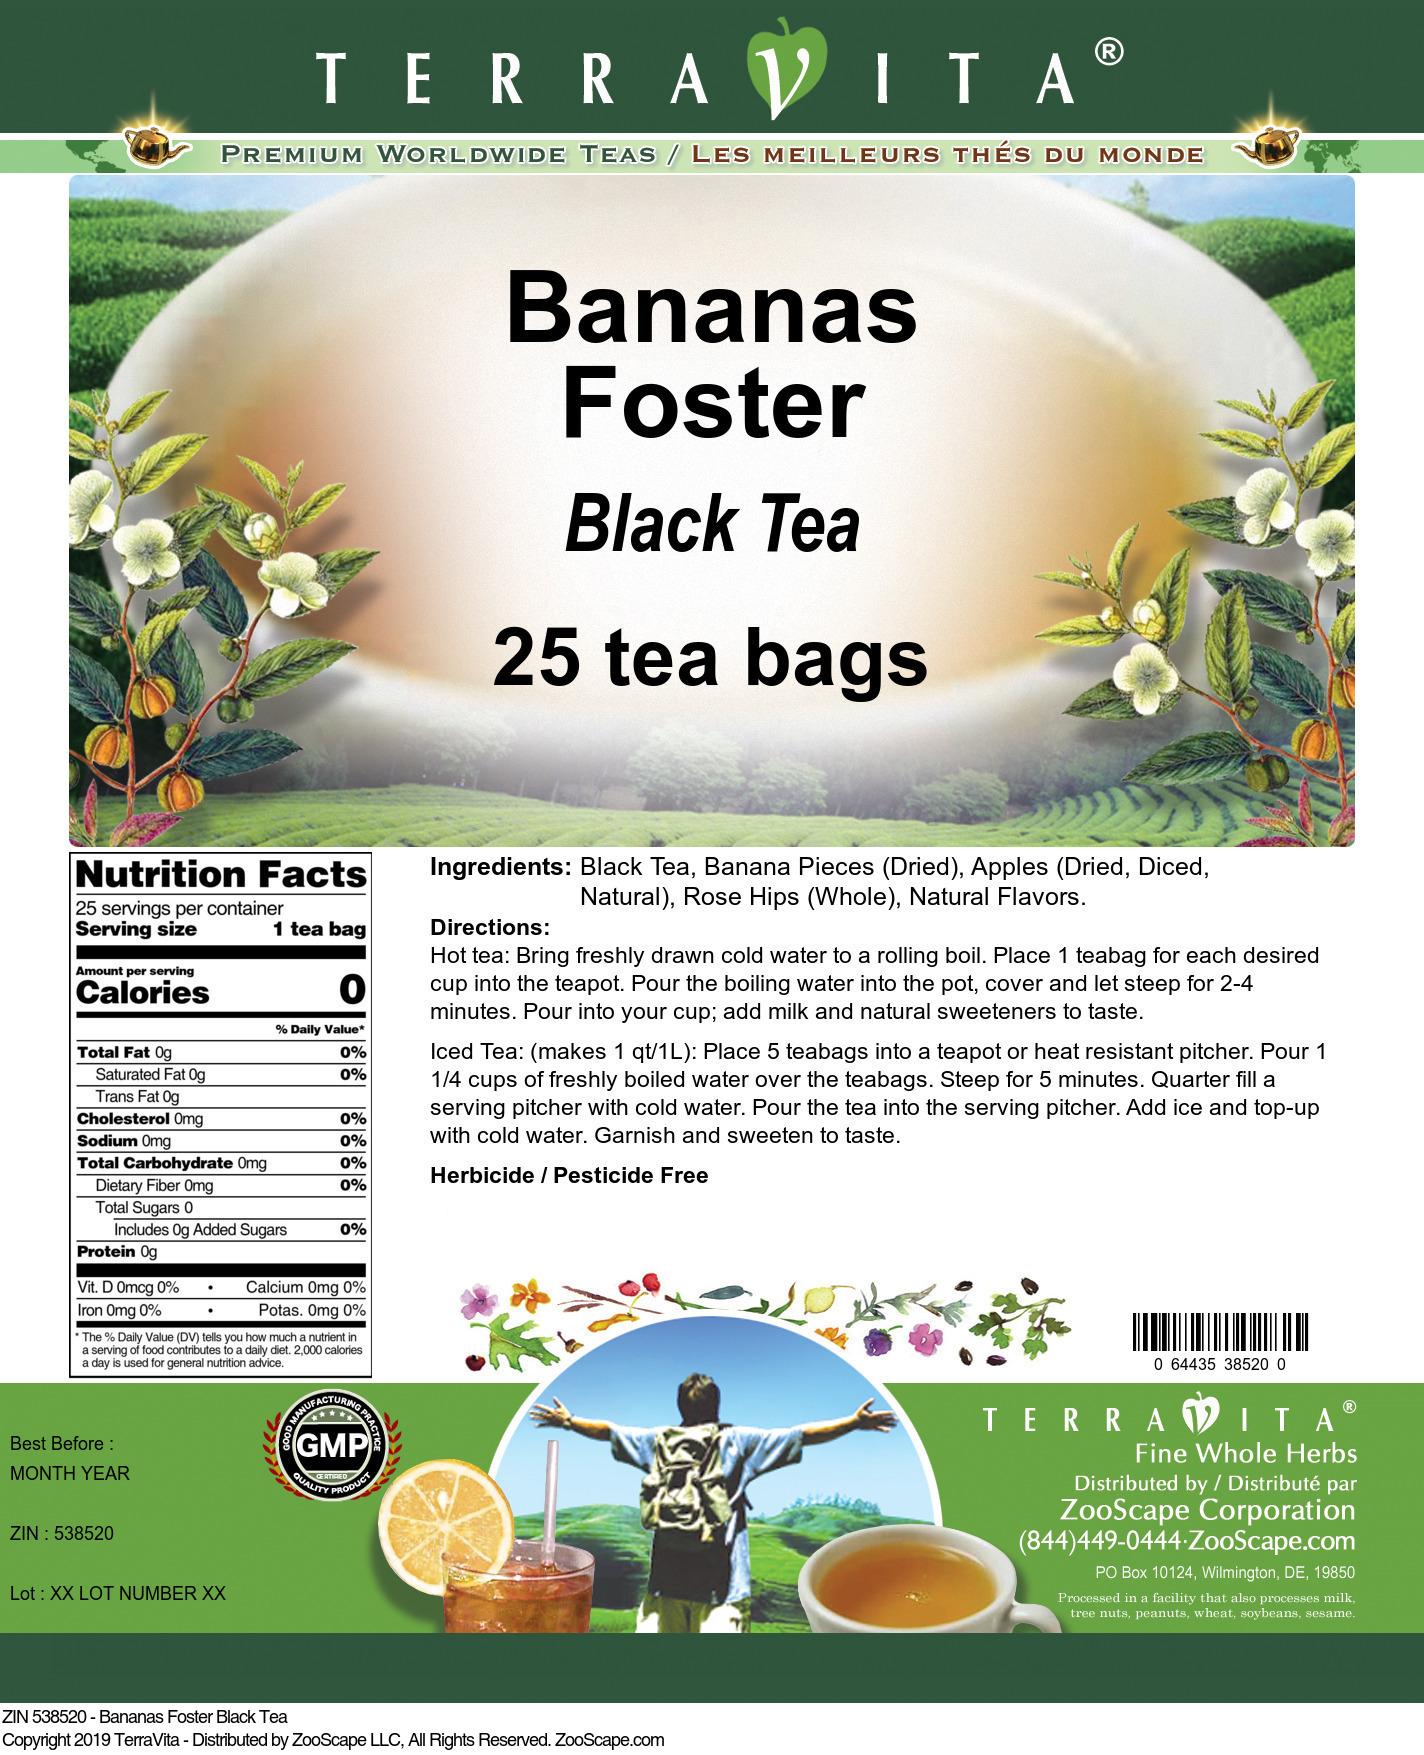 Banana Foster Black Tea